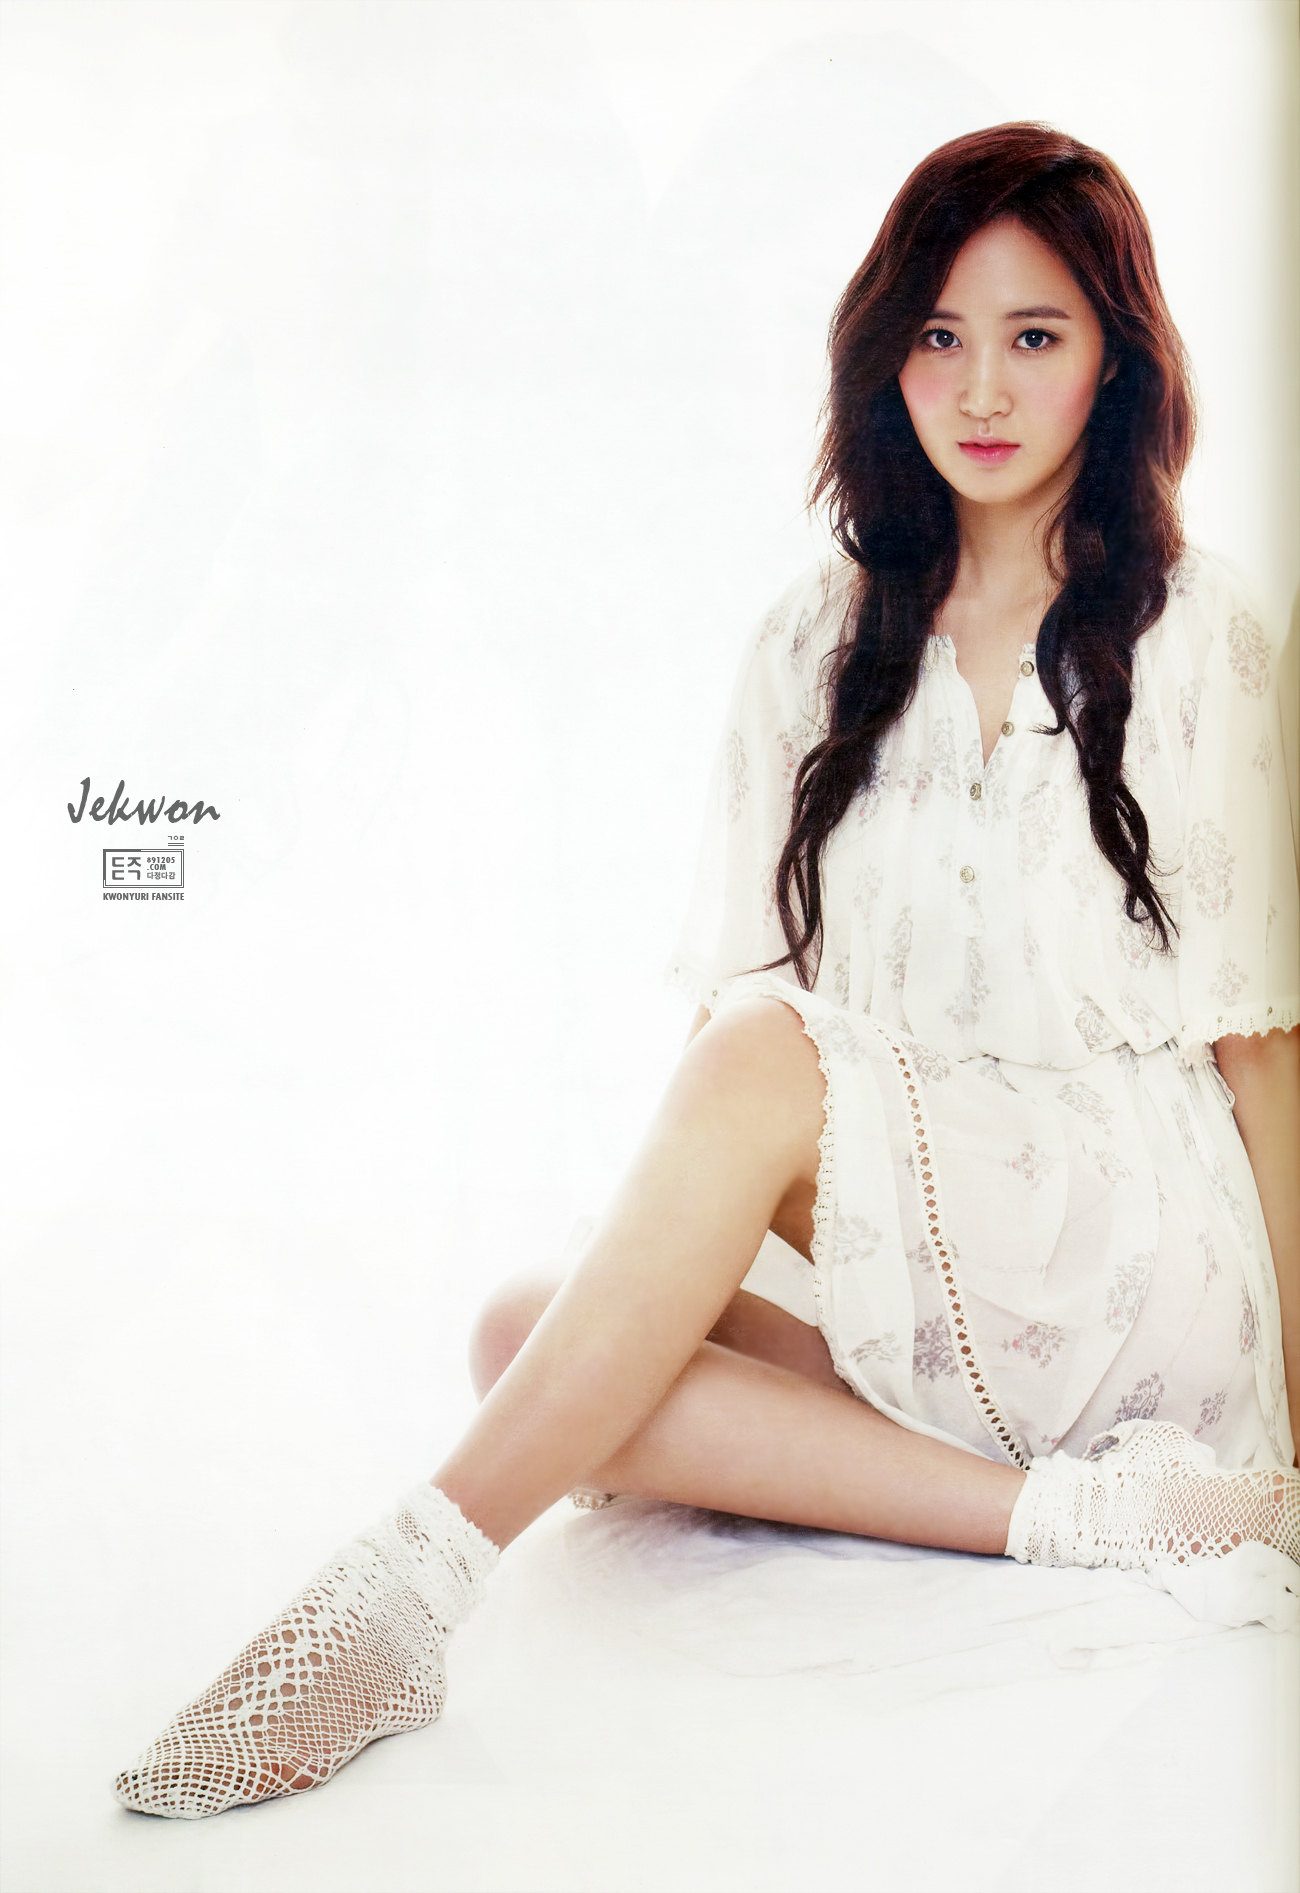 Sunny Girls Generation Wallpaper Opiniones De Kwon Yu Ri